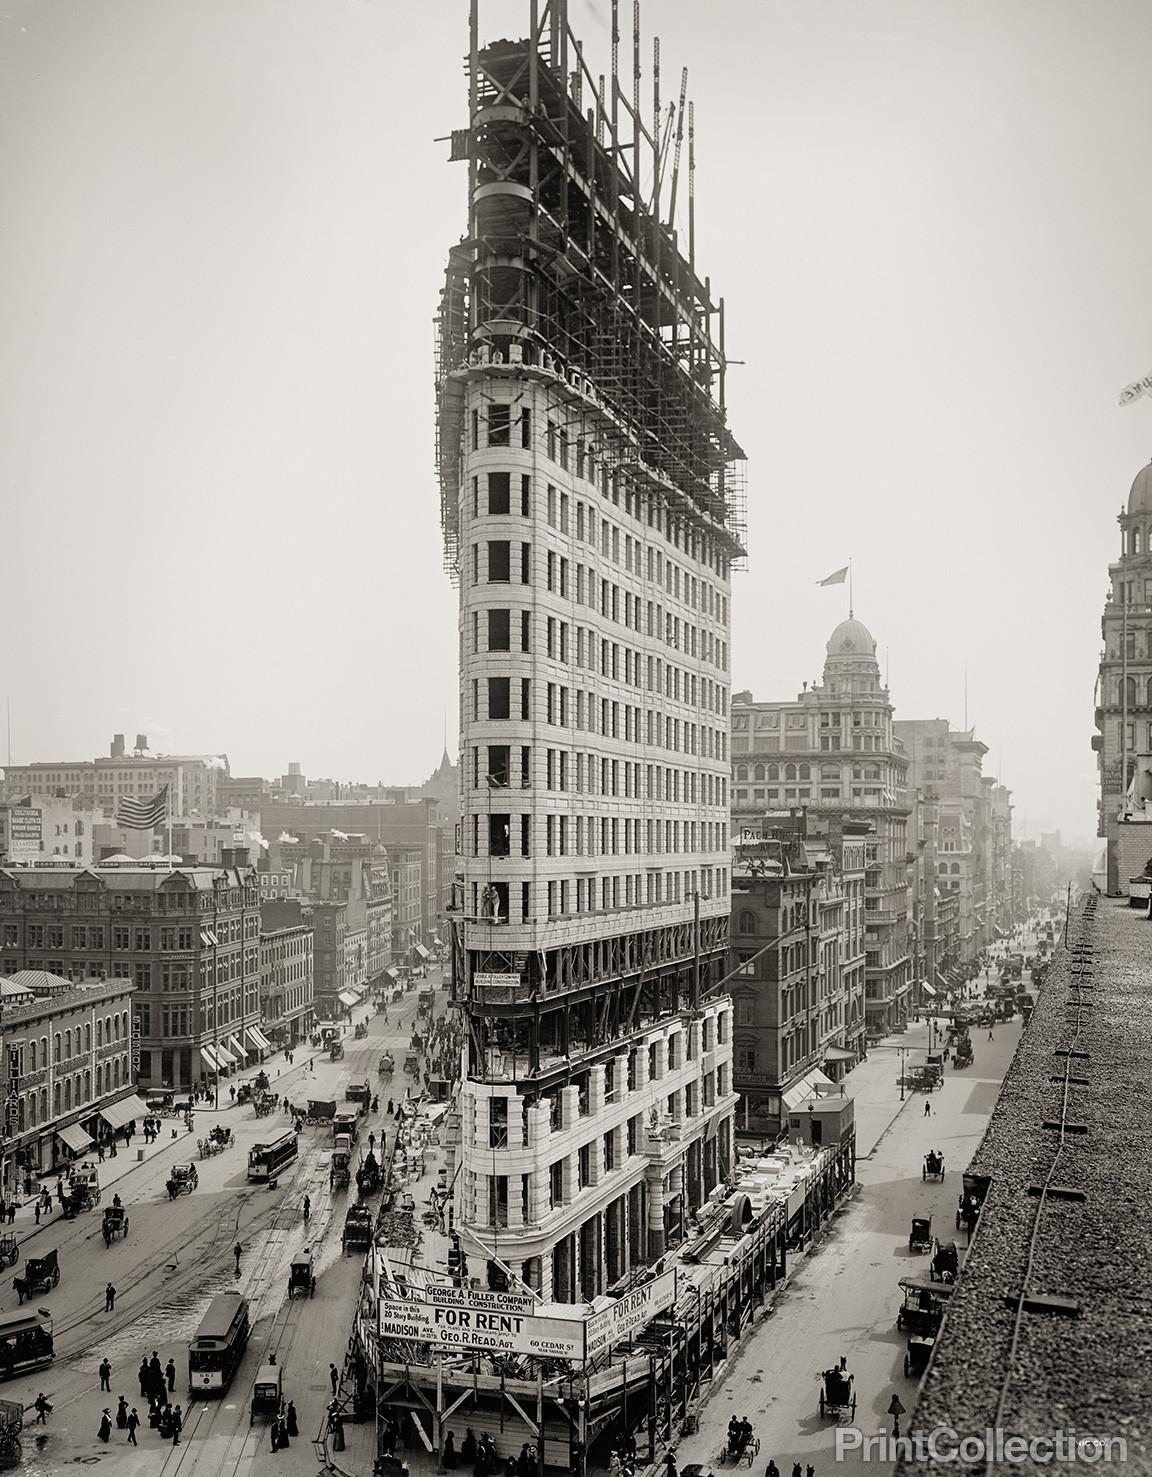 old photos of the flatiron building under construction new york city 1902 vintage everyday. Black Bedroom Furniture Sets. Home Design Ideas